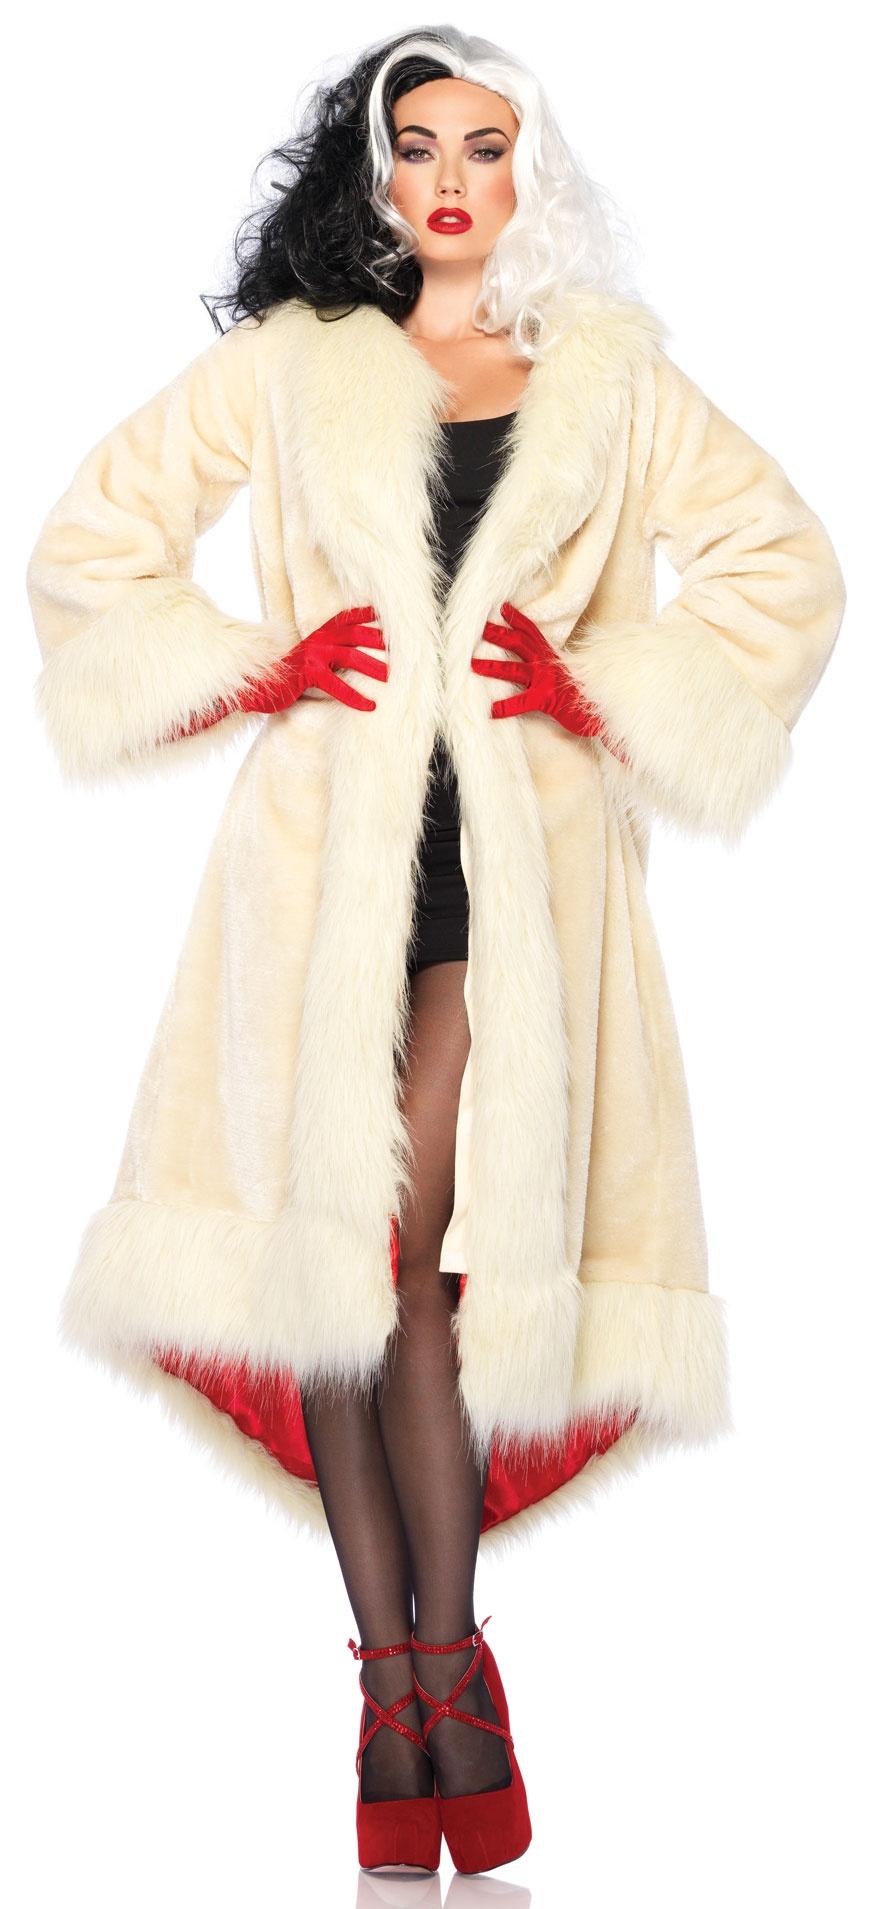 cruella deville coat villain adult costume mr costumes. Black Bedroom Furniture Sets. Home Design Ideas